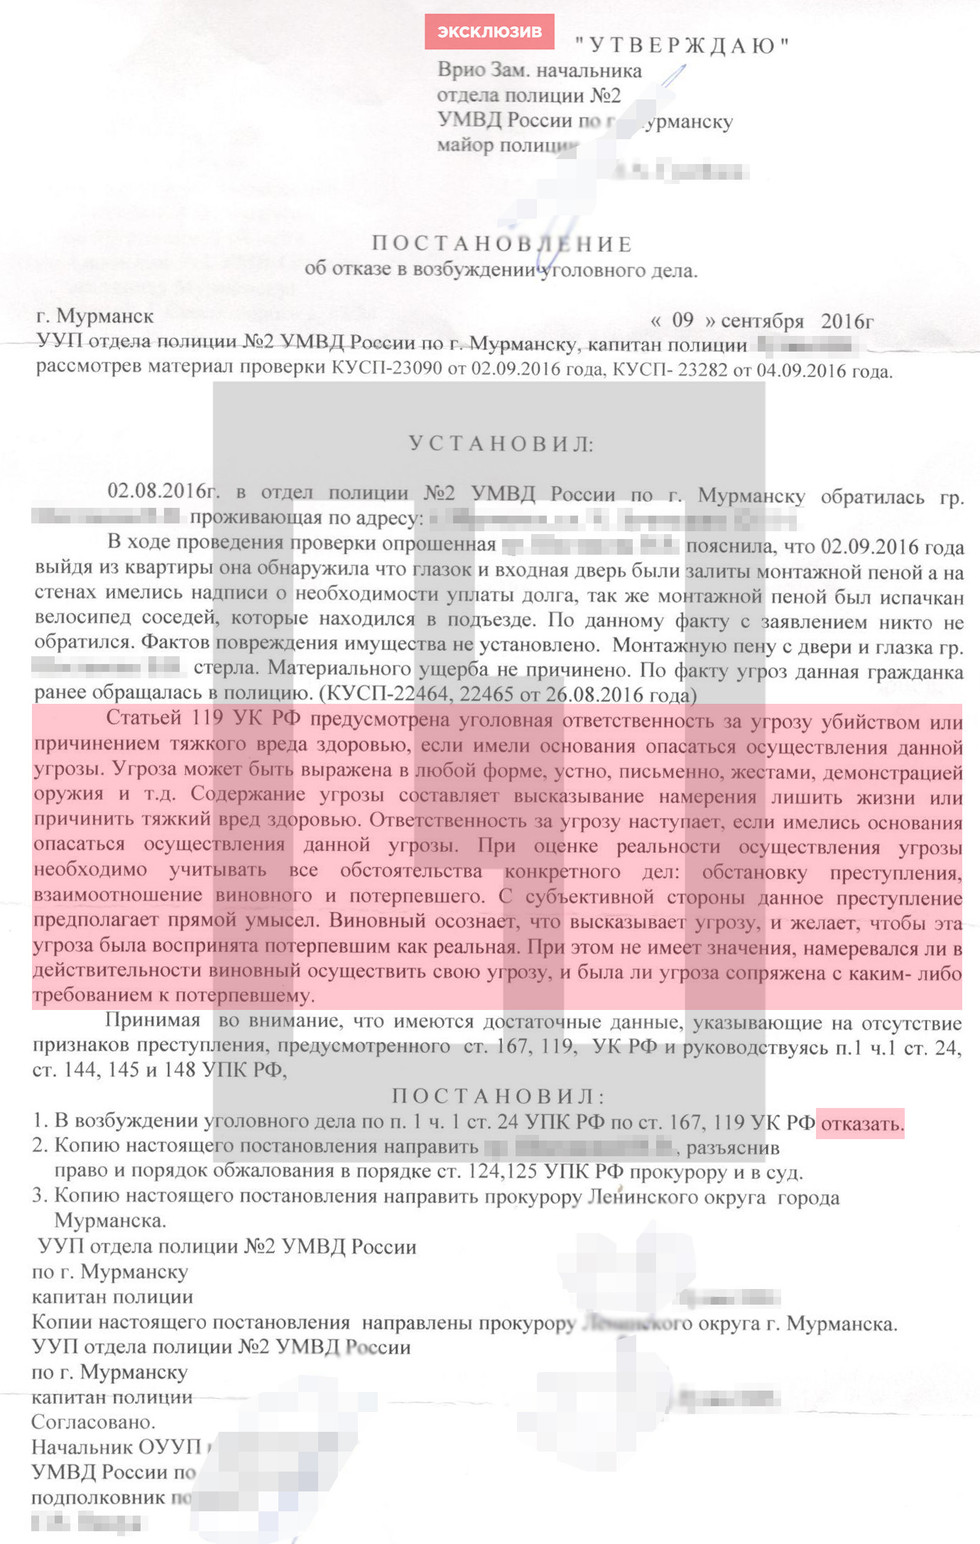 https://img-fotki.yandex.ru/get/30752/163146787.4e6/0_1ab054_34fc7af9_orig.jpg